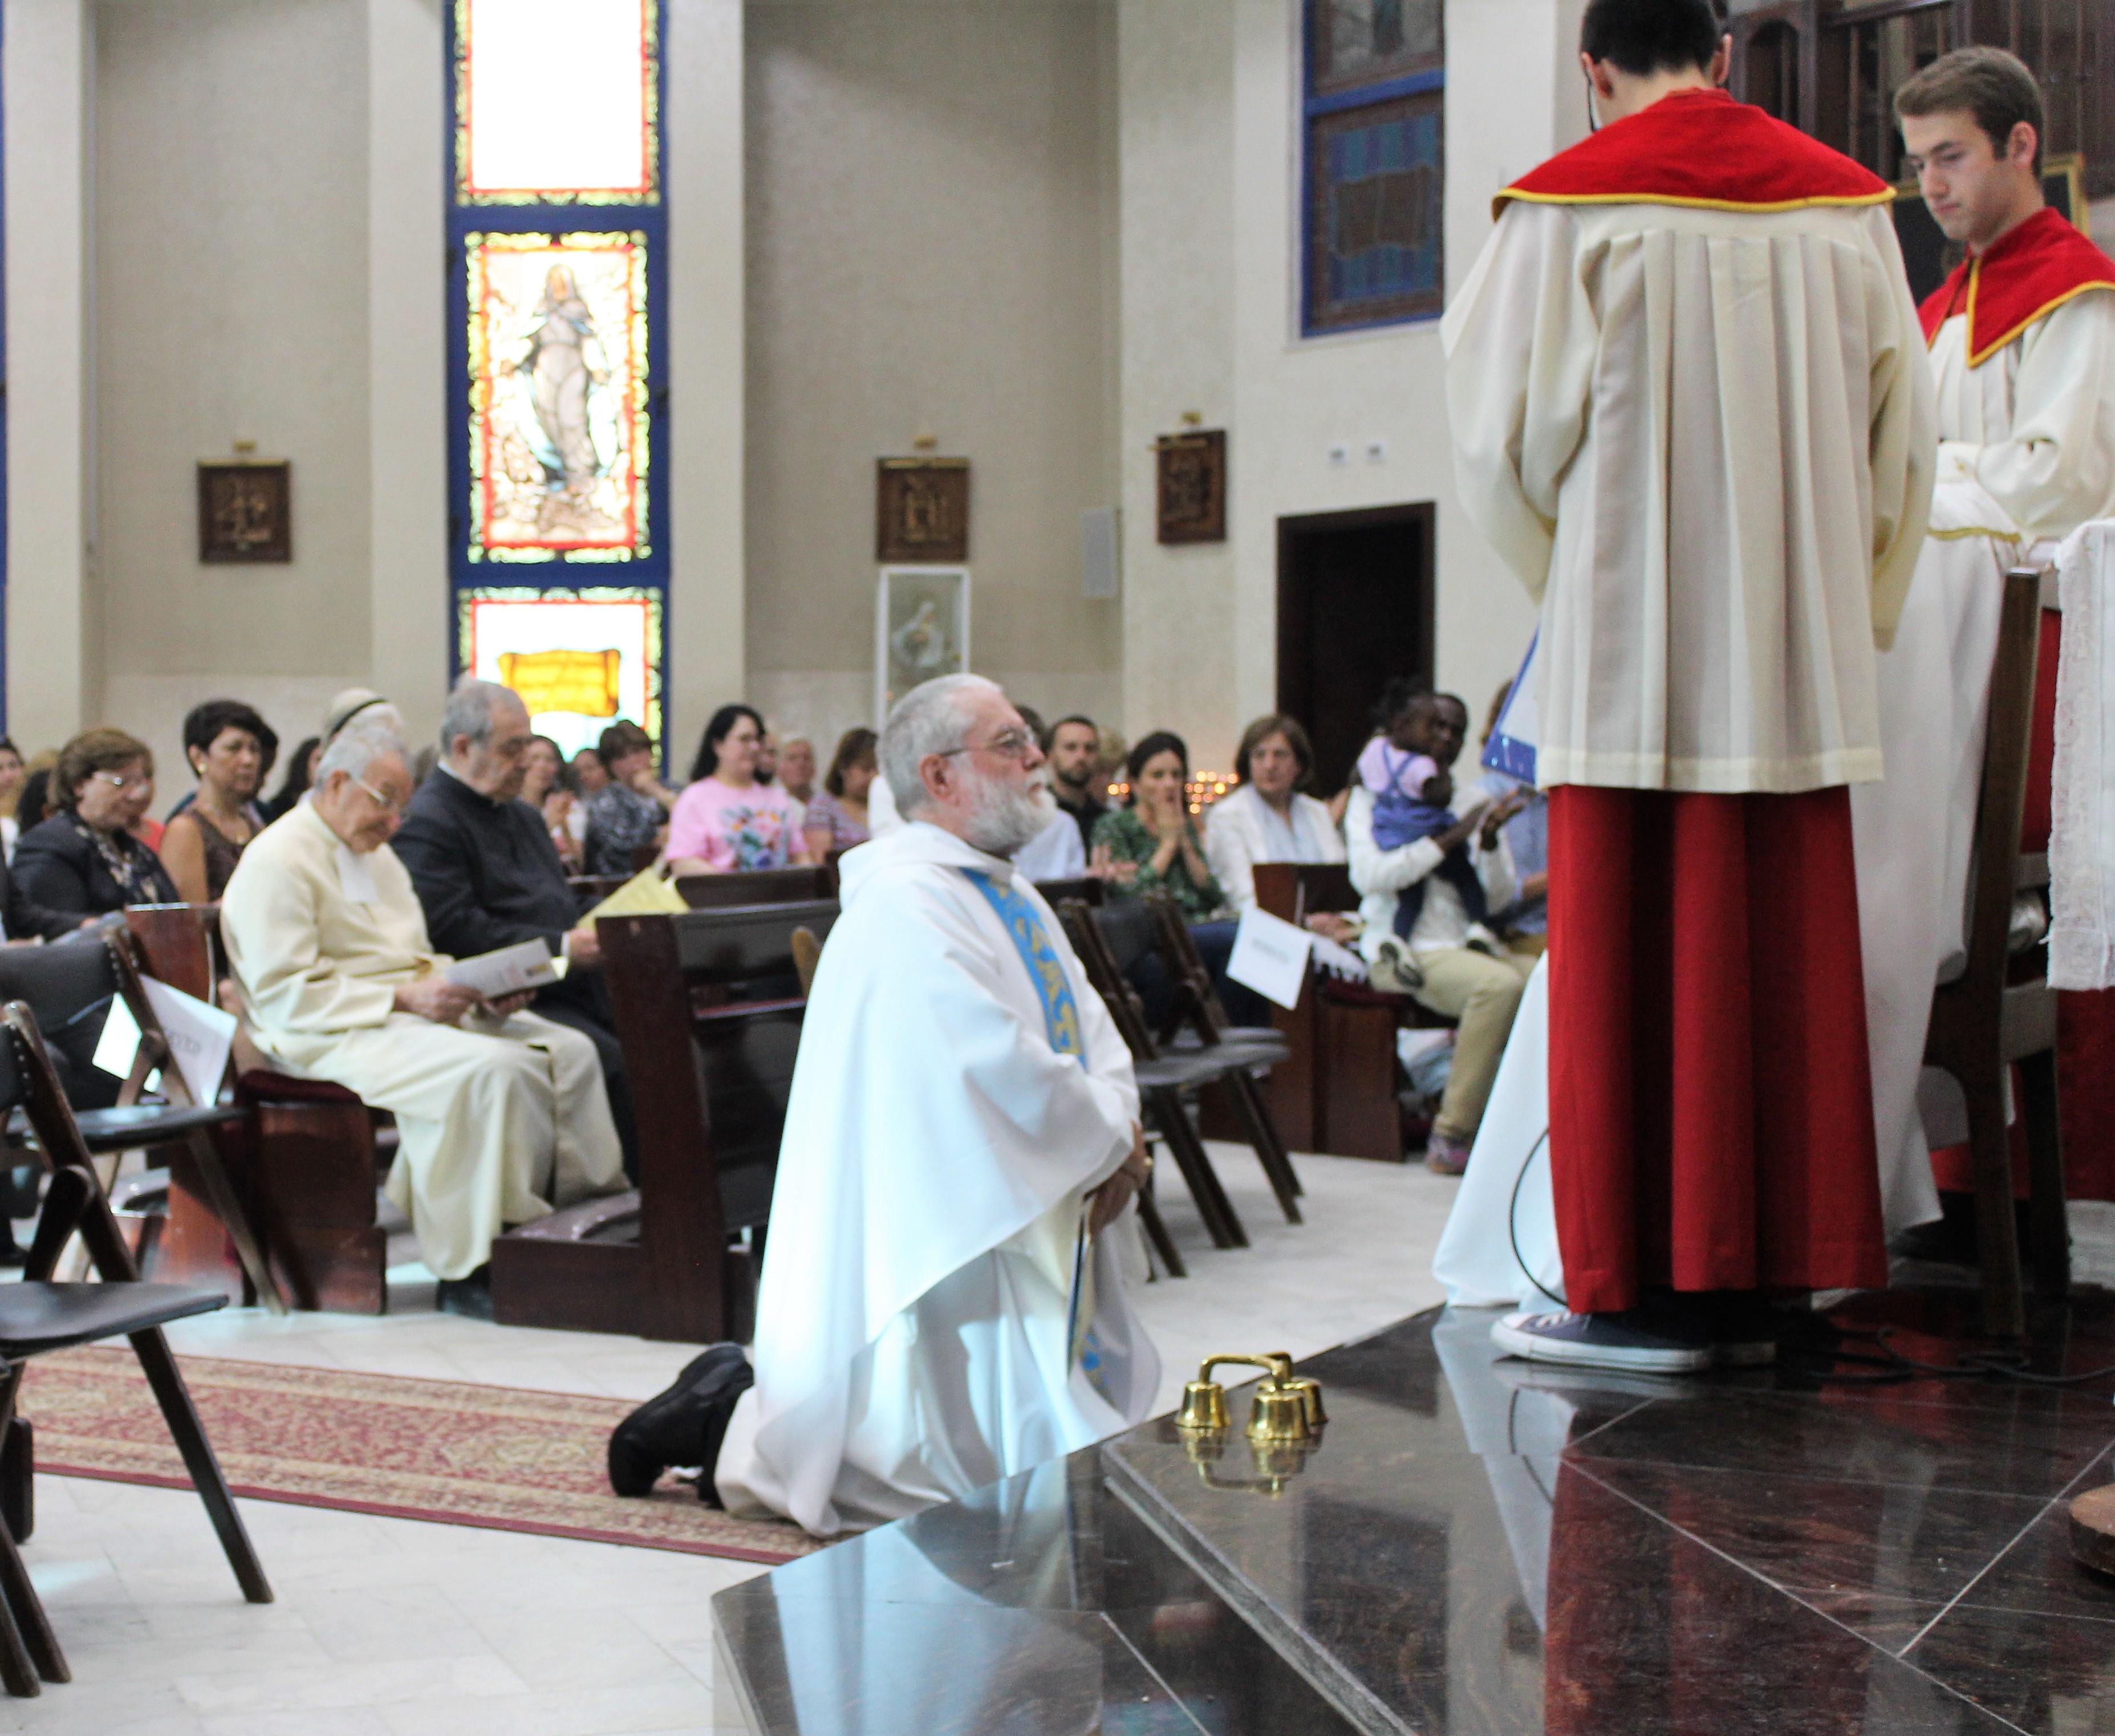 Fr. John kneeling before the Bishop